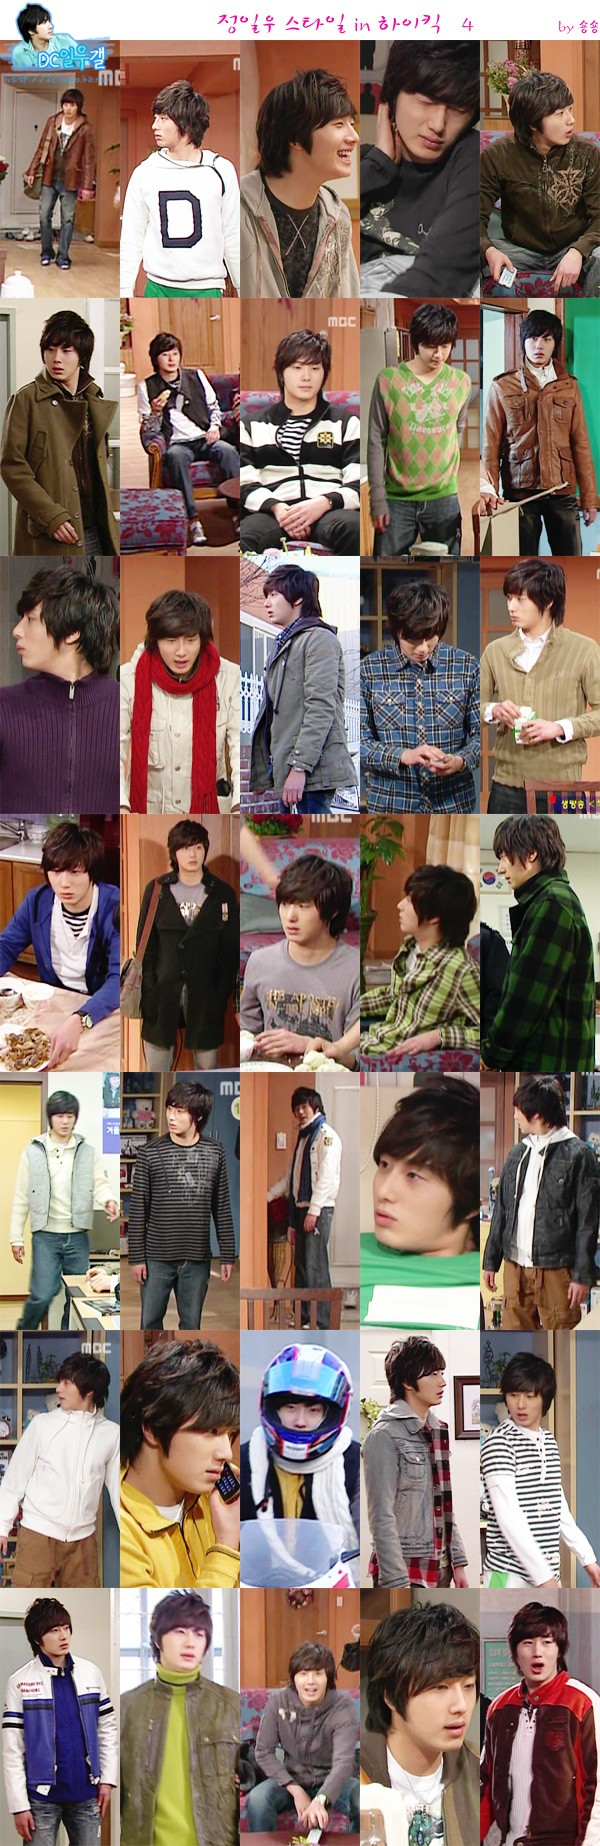 2007 JIW Collage 5